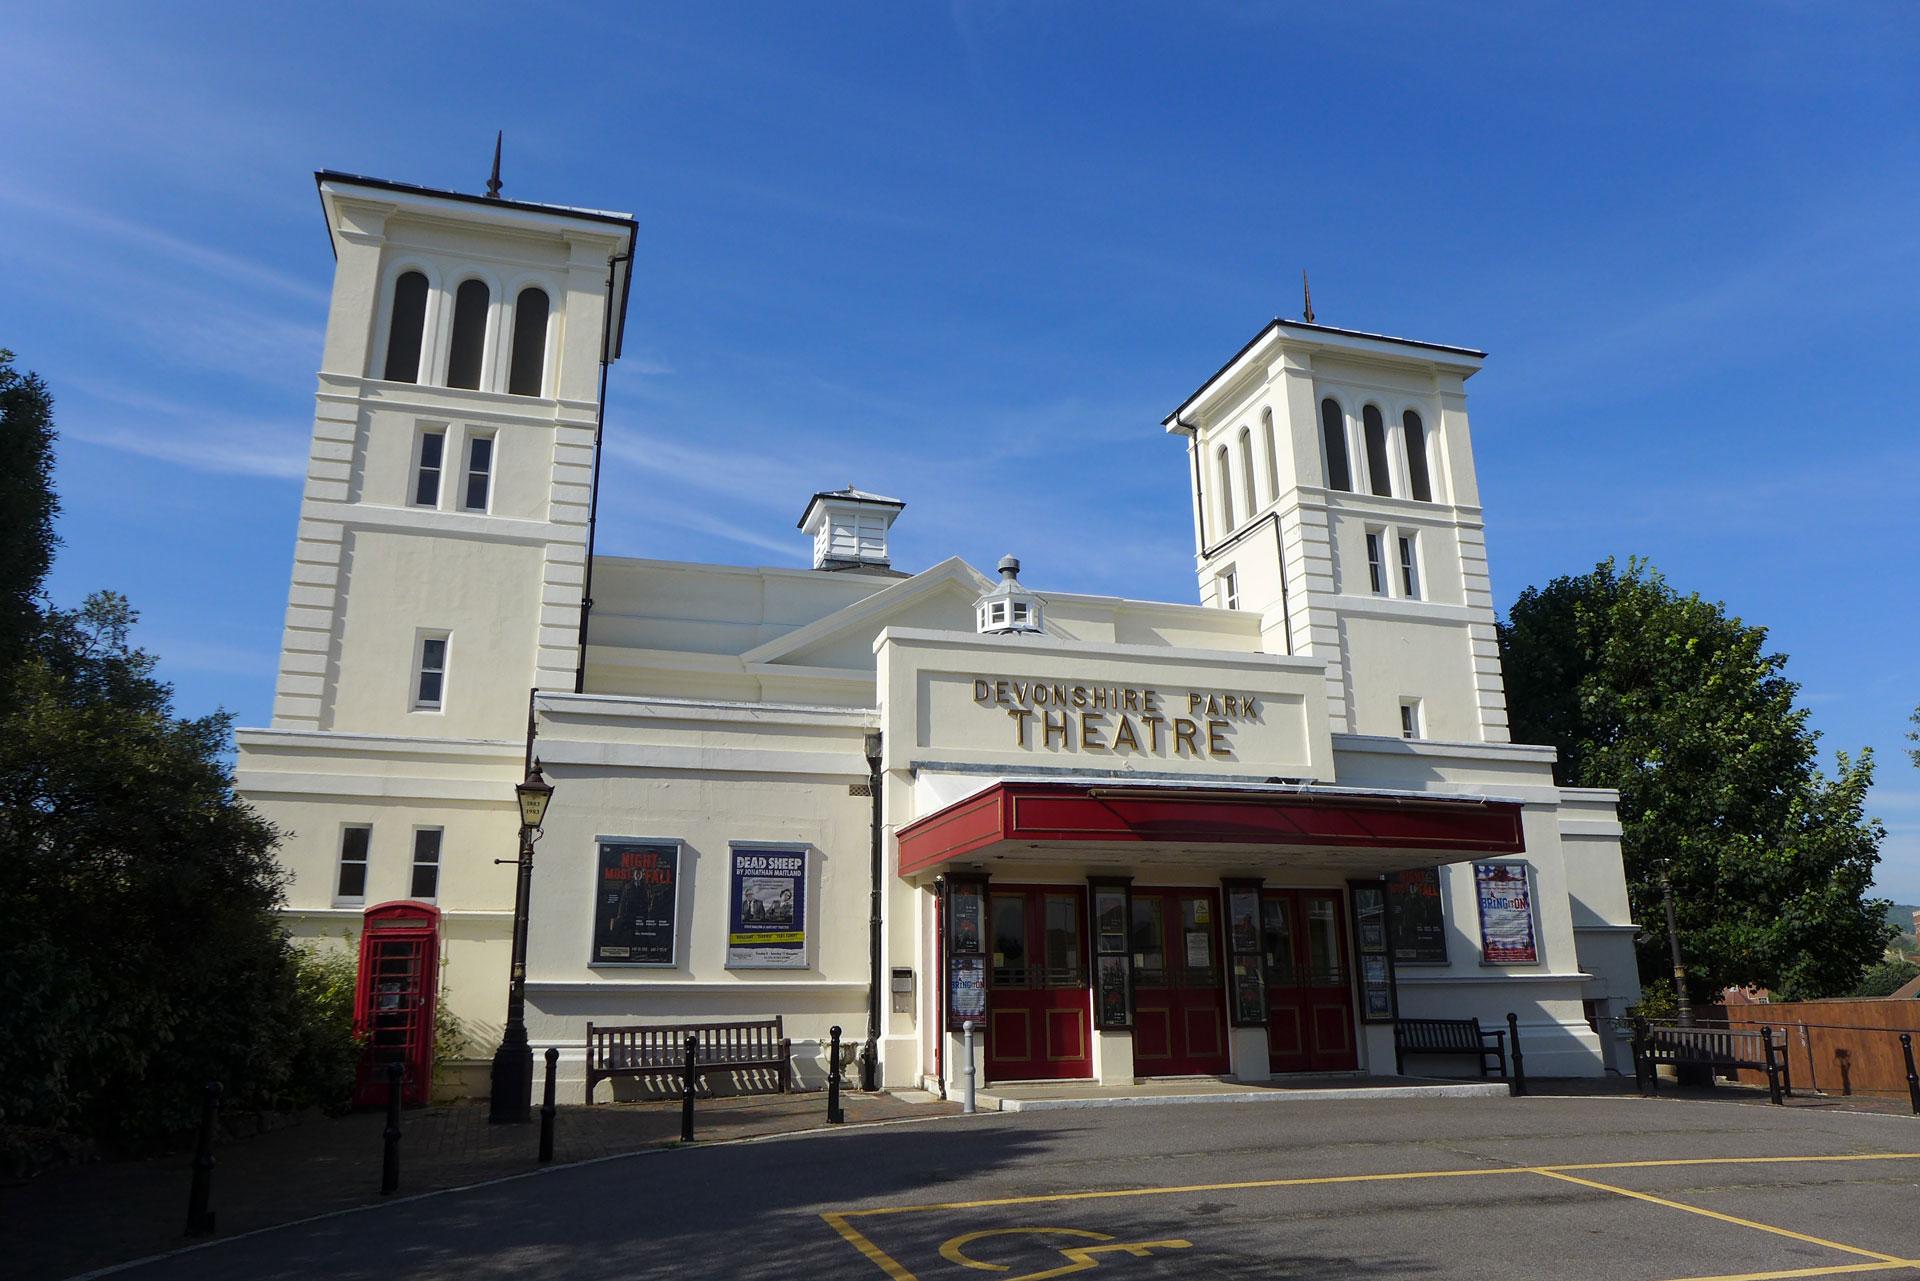 Gallery frank matcham society for The devonshire